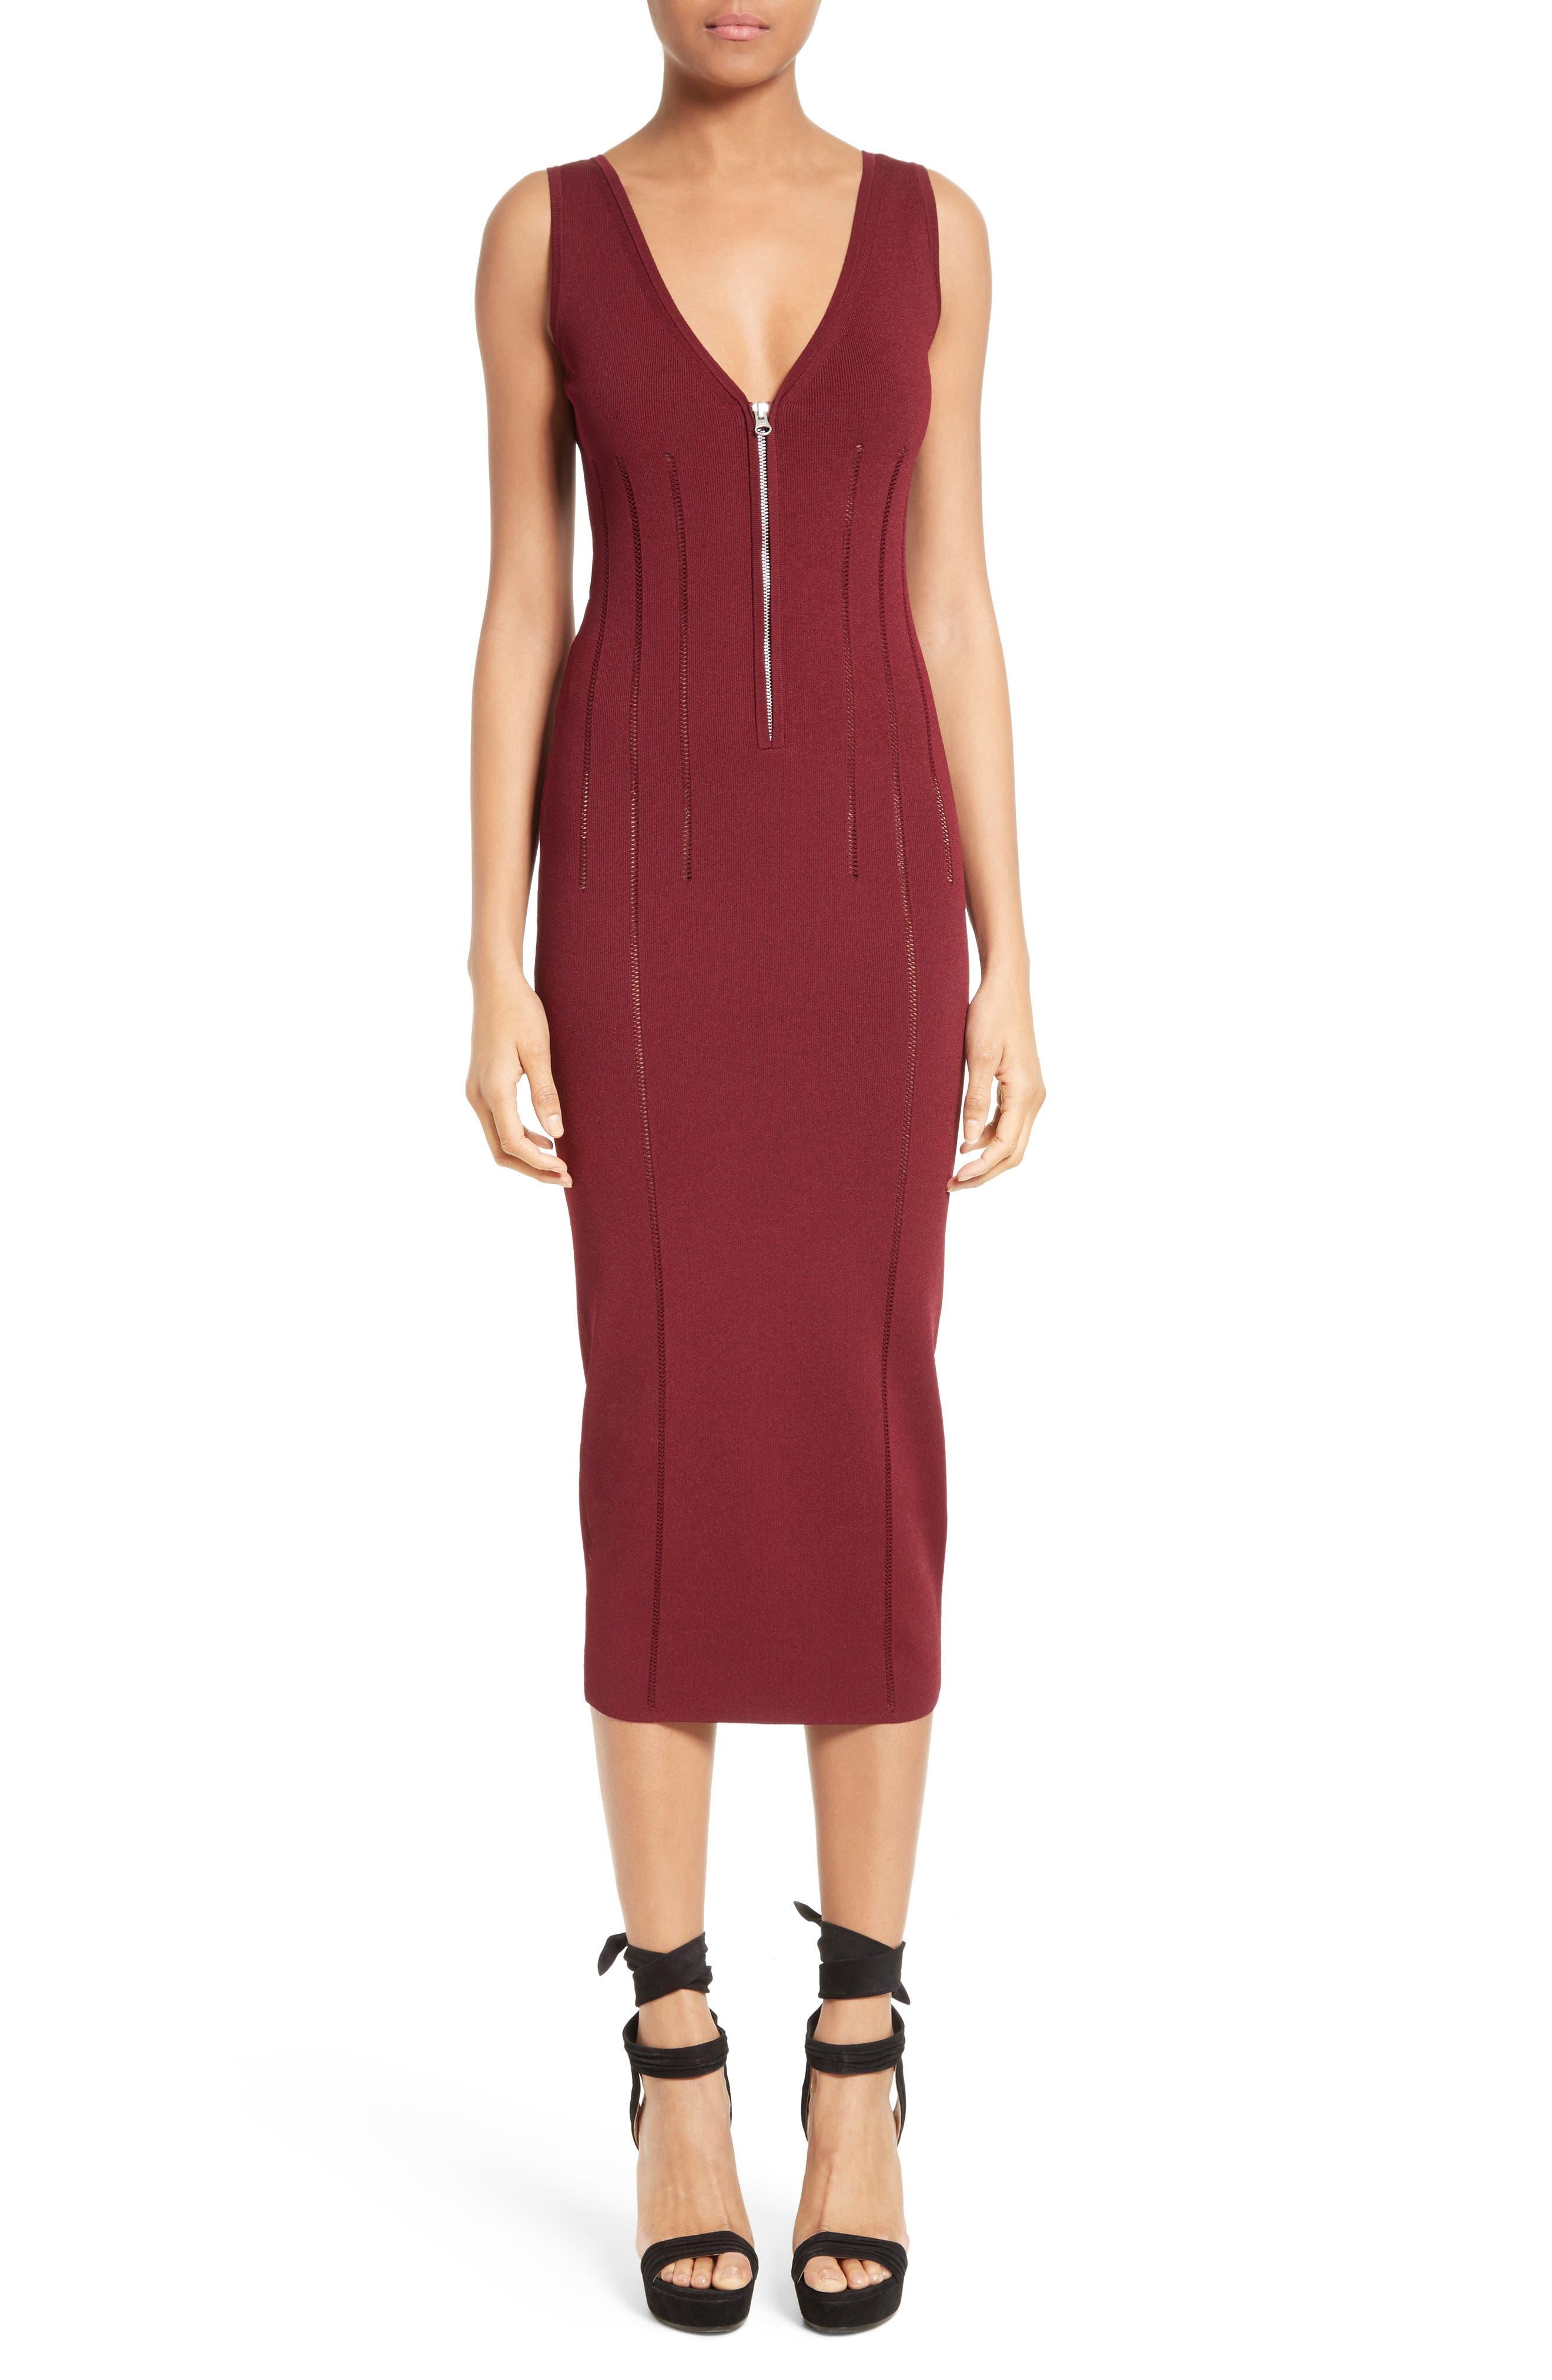 McQ Alexander McQueen Body-Con Dress